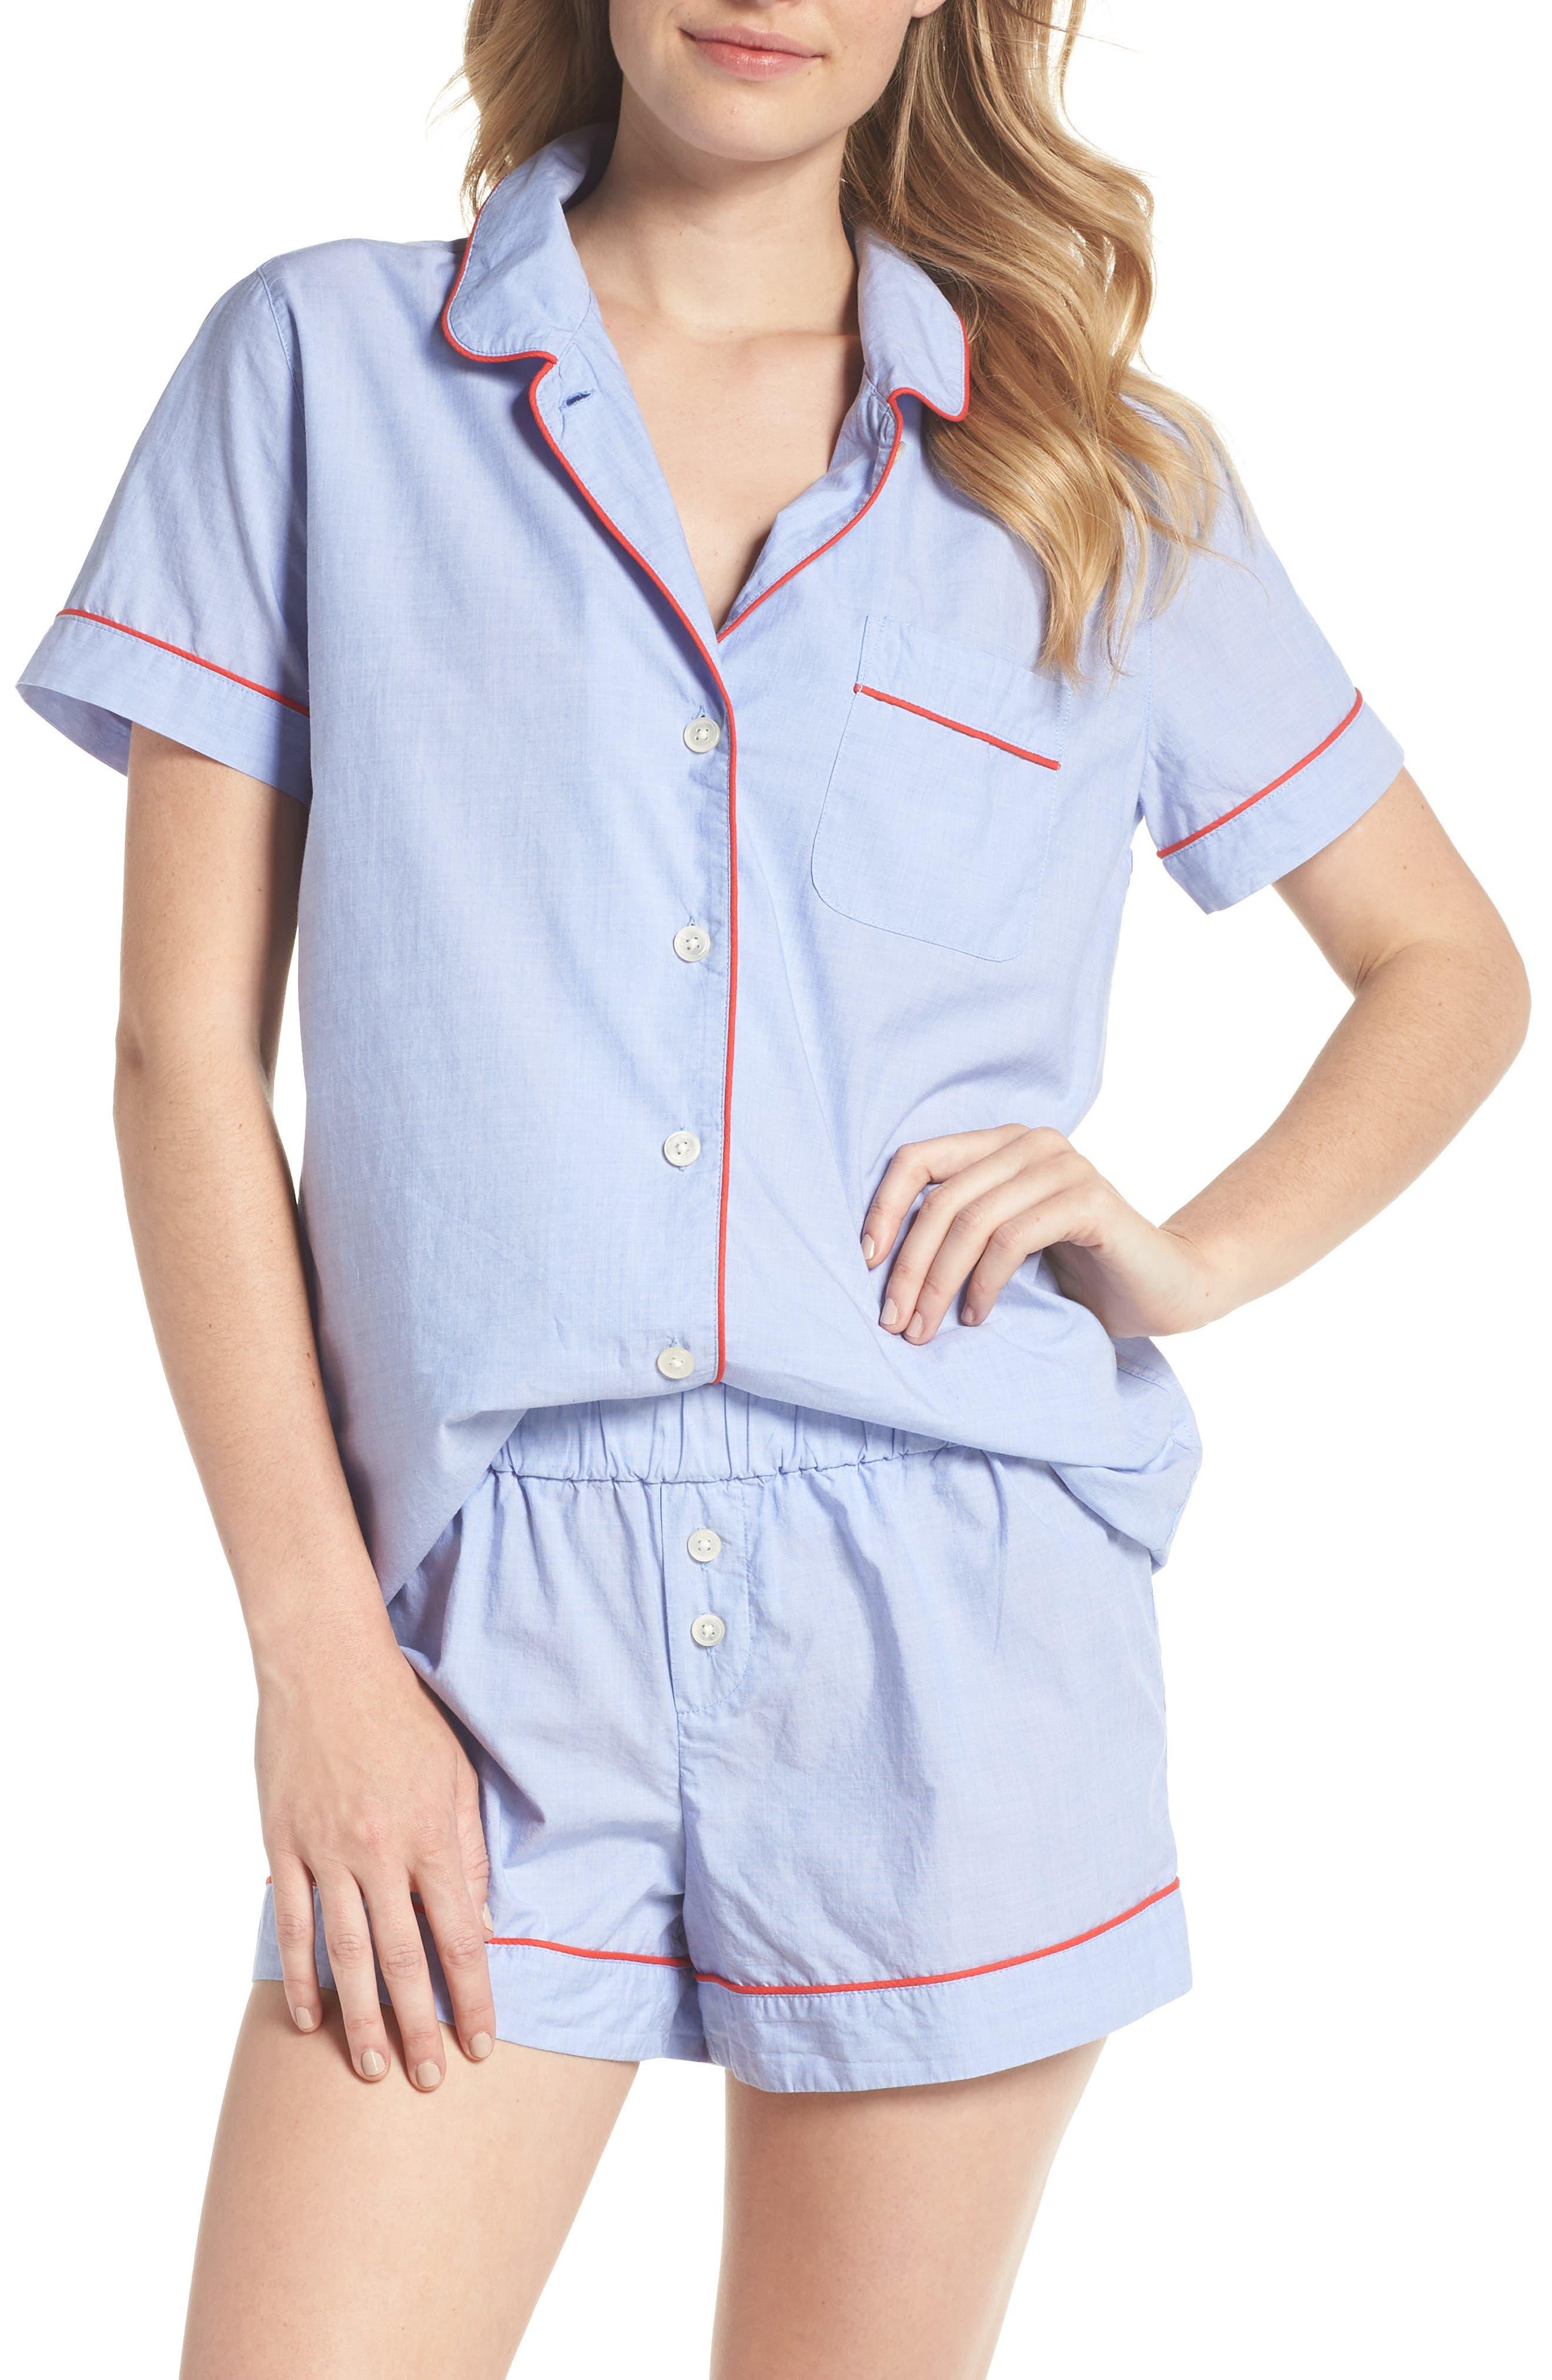 J.CREW Tipped Pajama Set, Main, color, 411